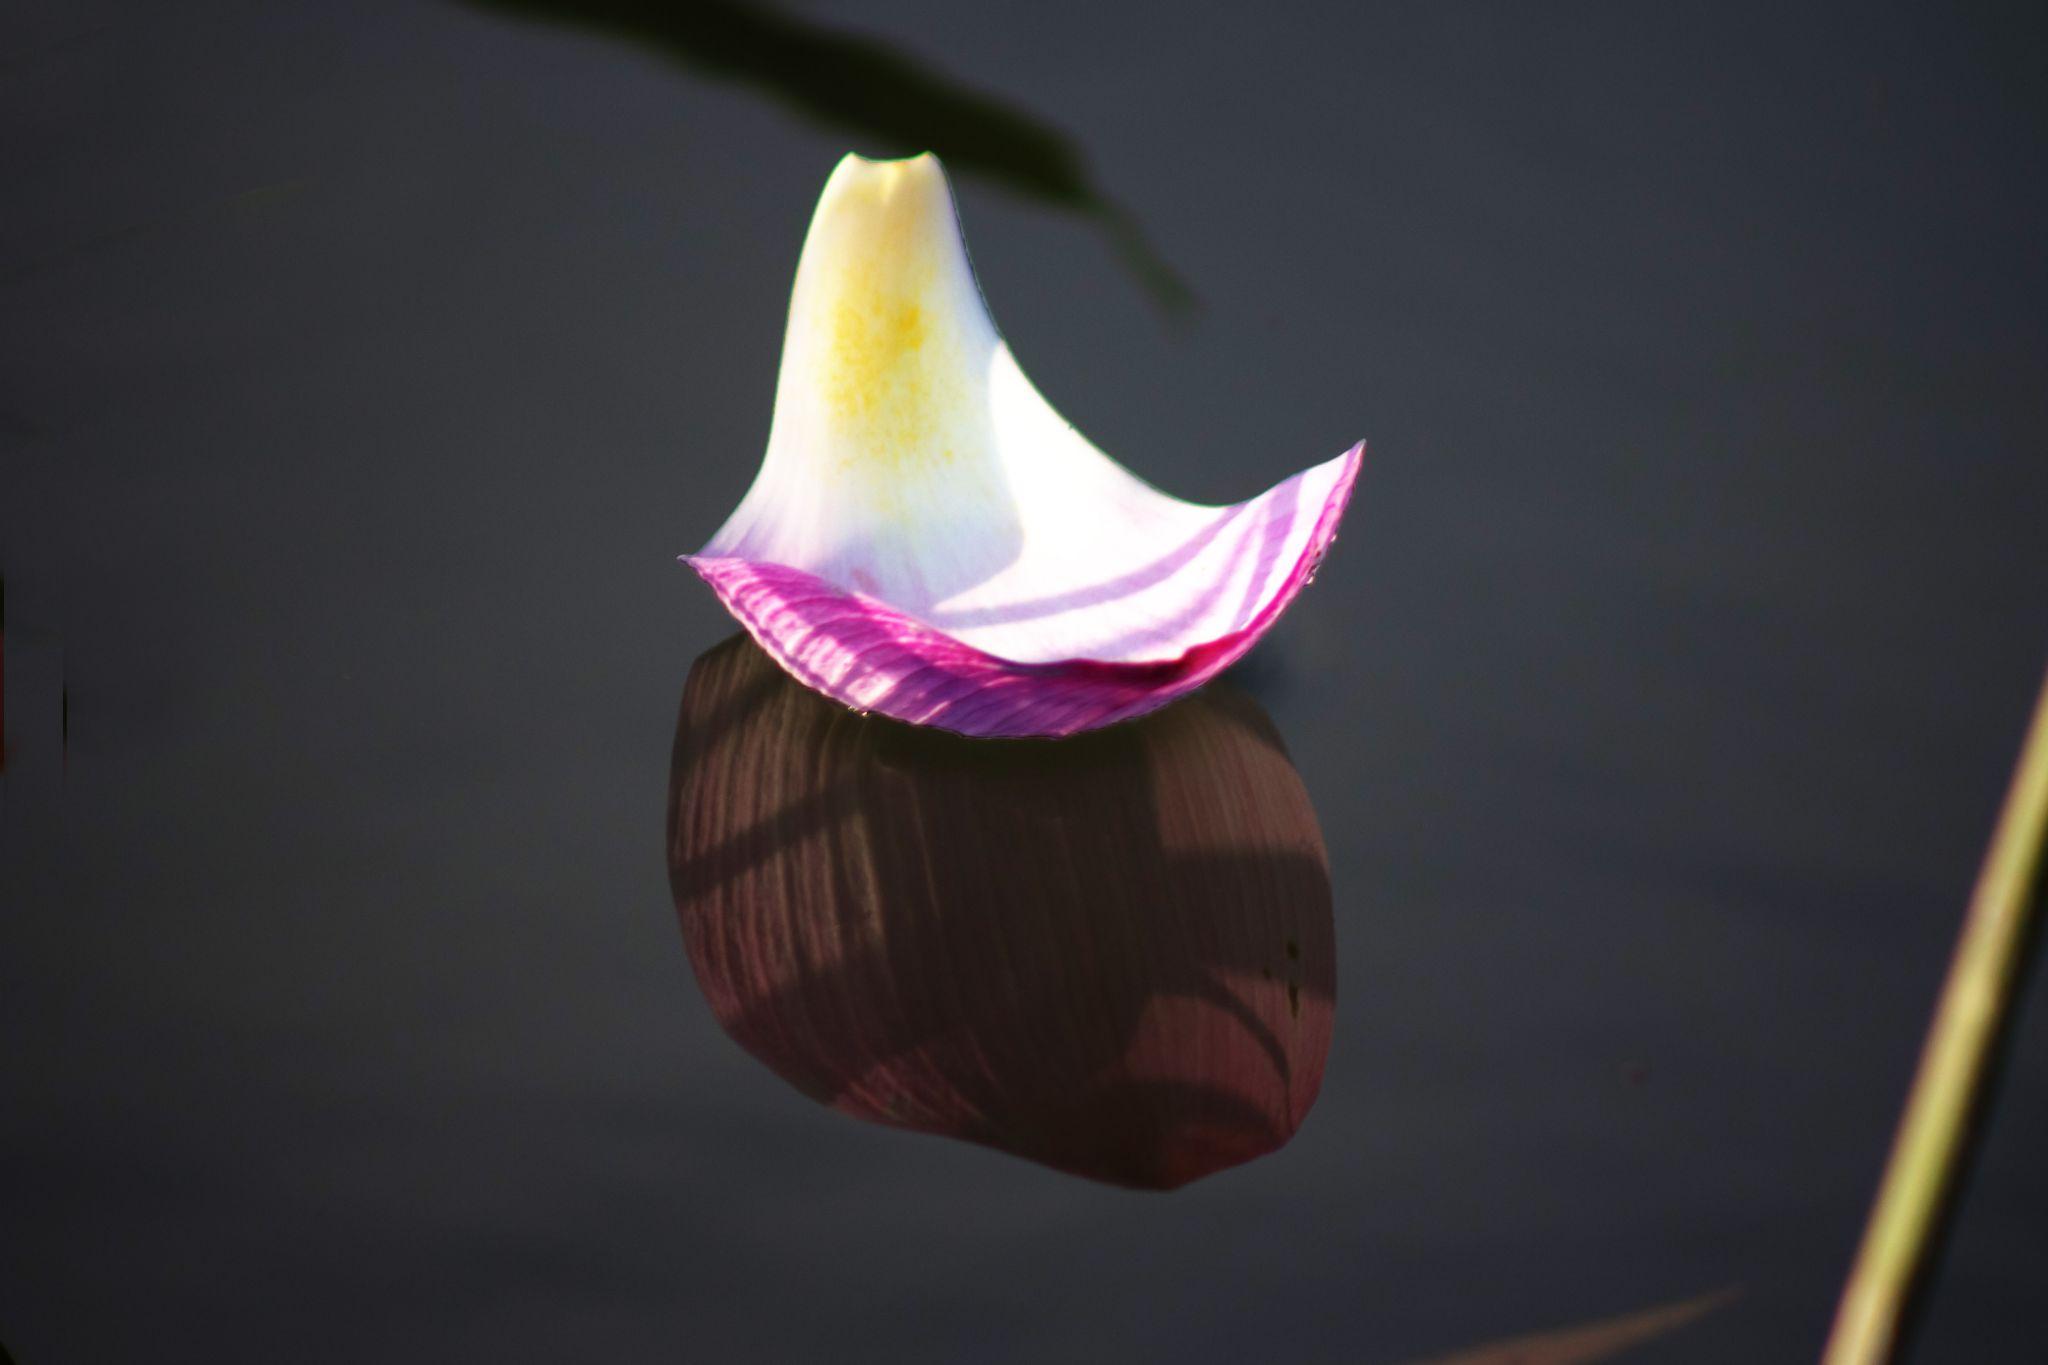 Boat lotus petals by Nhat giang